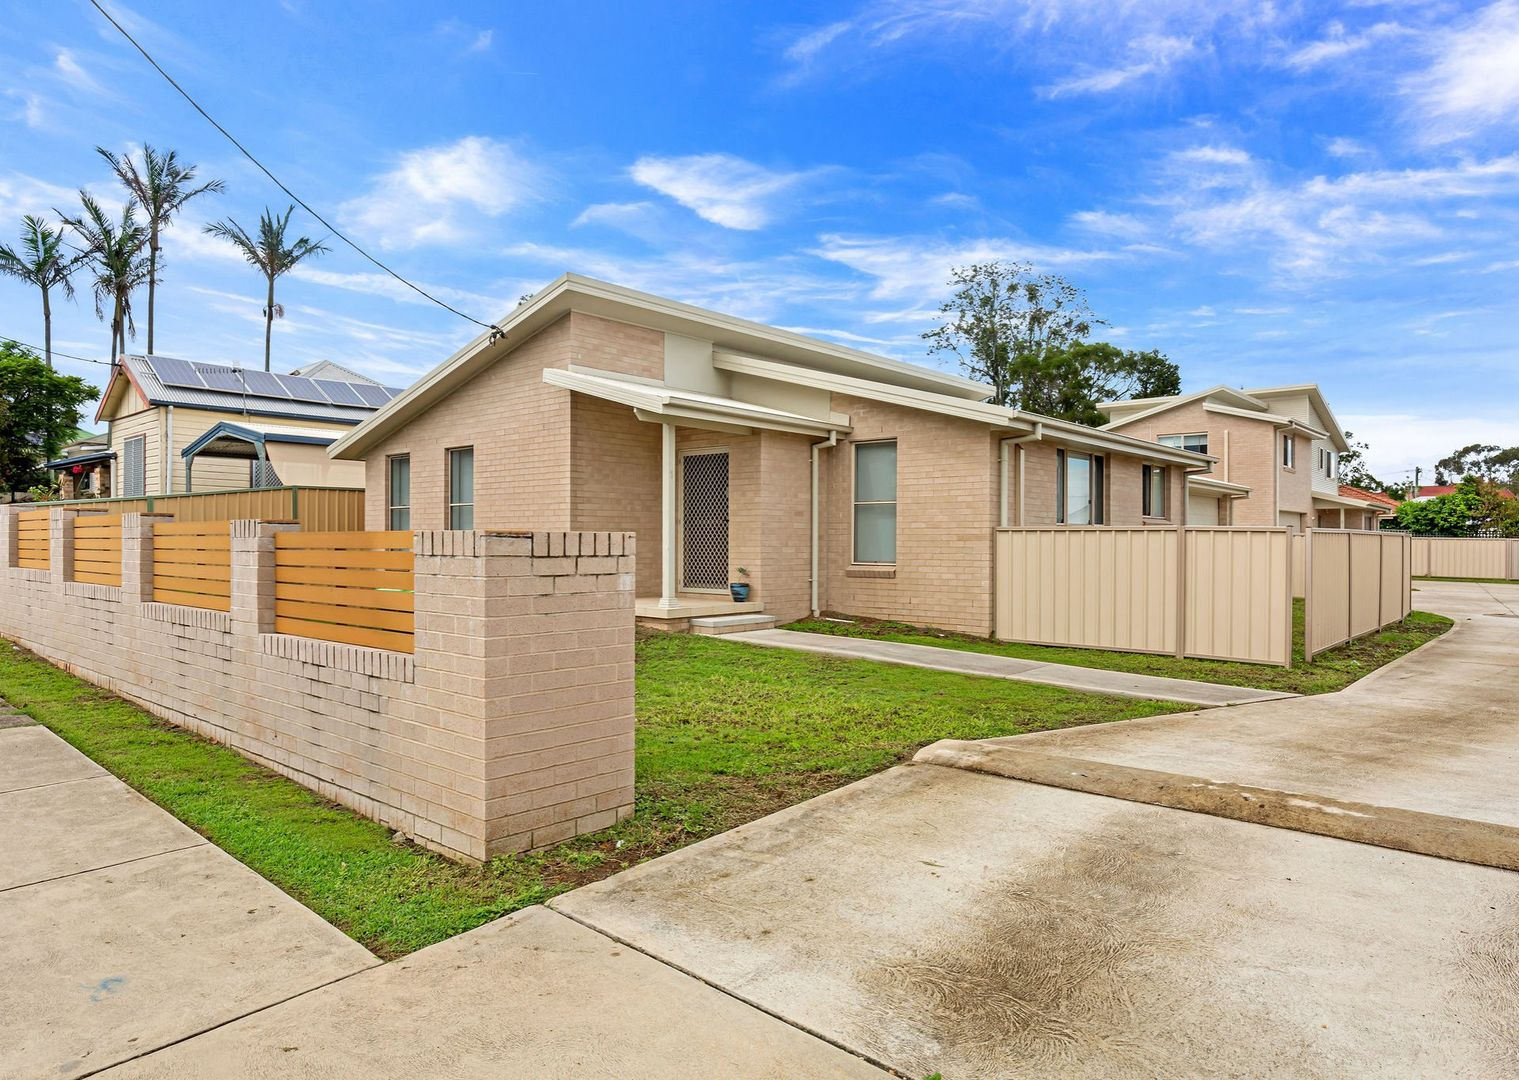 90 A Commerce Street, Taree NSW 2430, Image 1